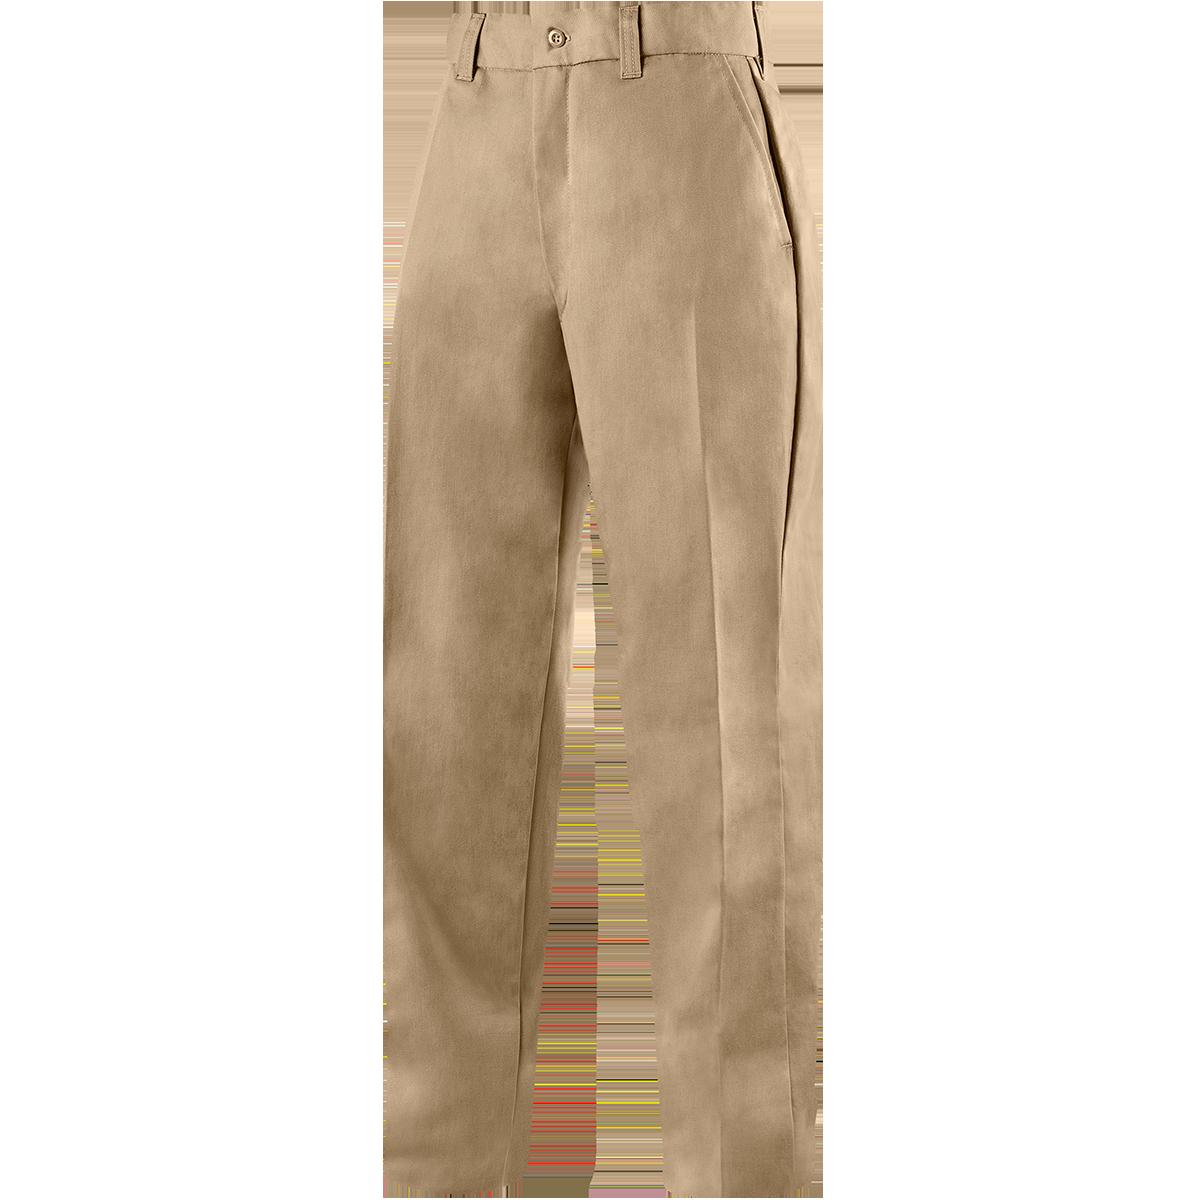 Khaki Pants PNG - 43425